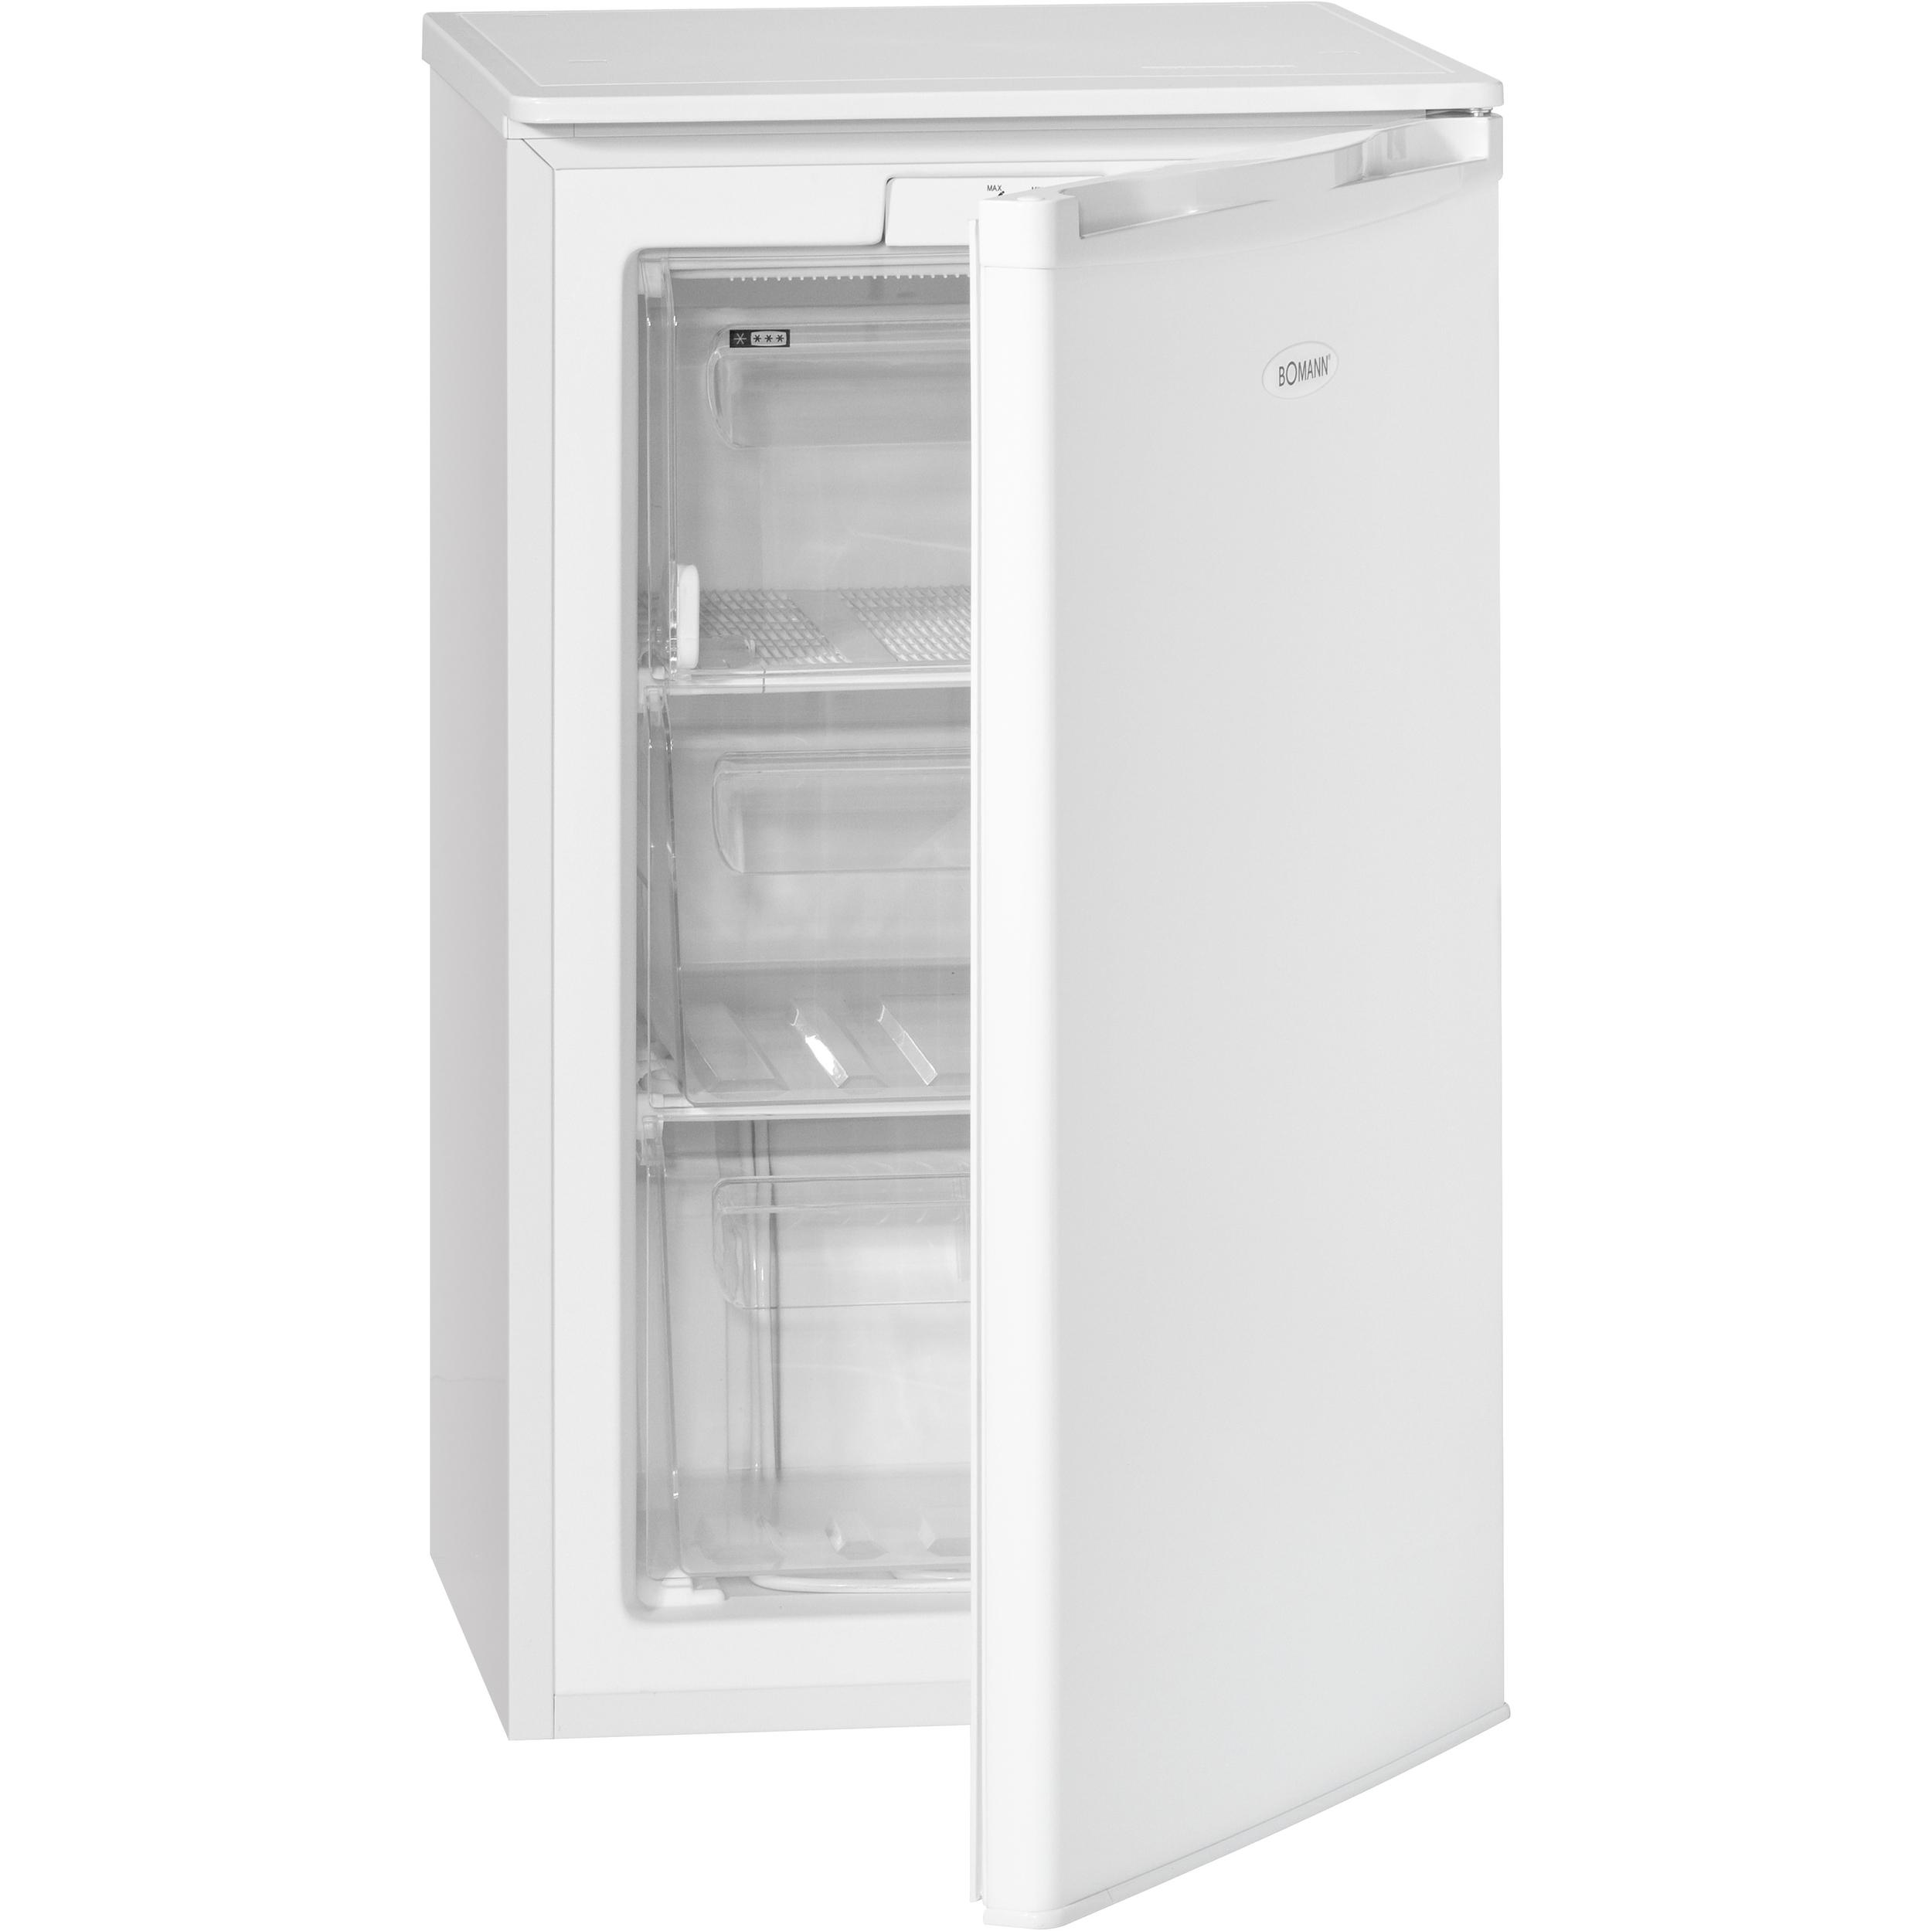 Морозильник Bomann GS 195